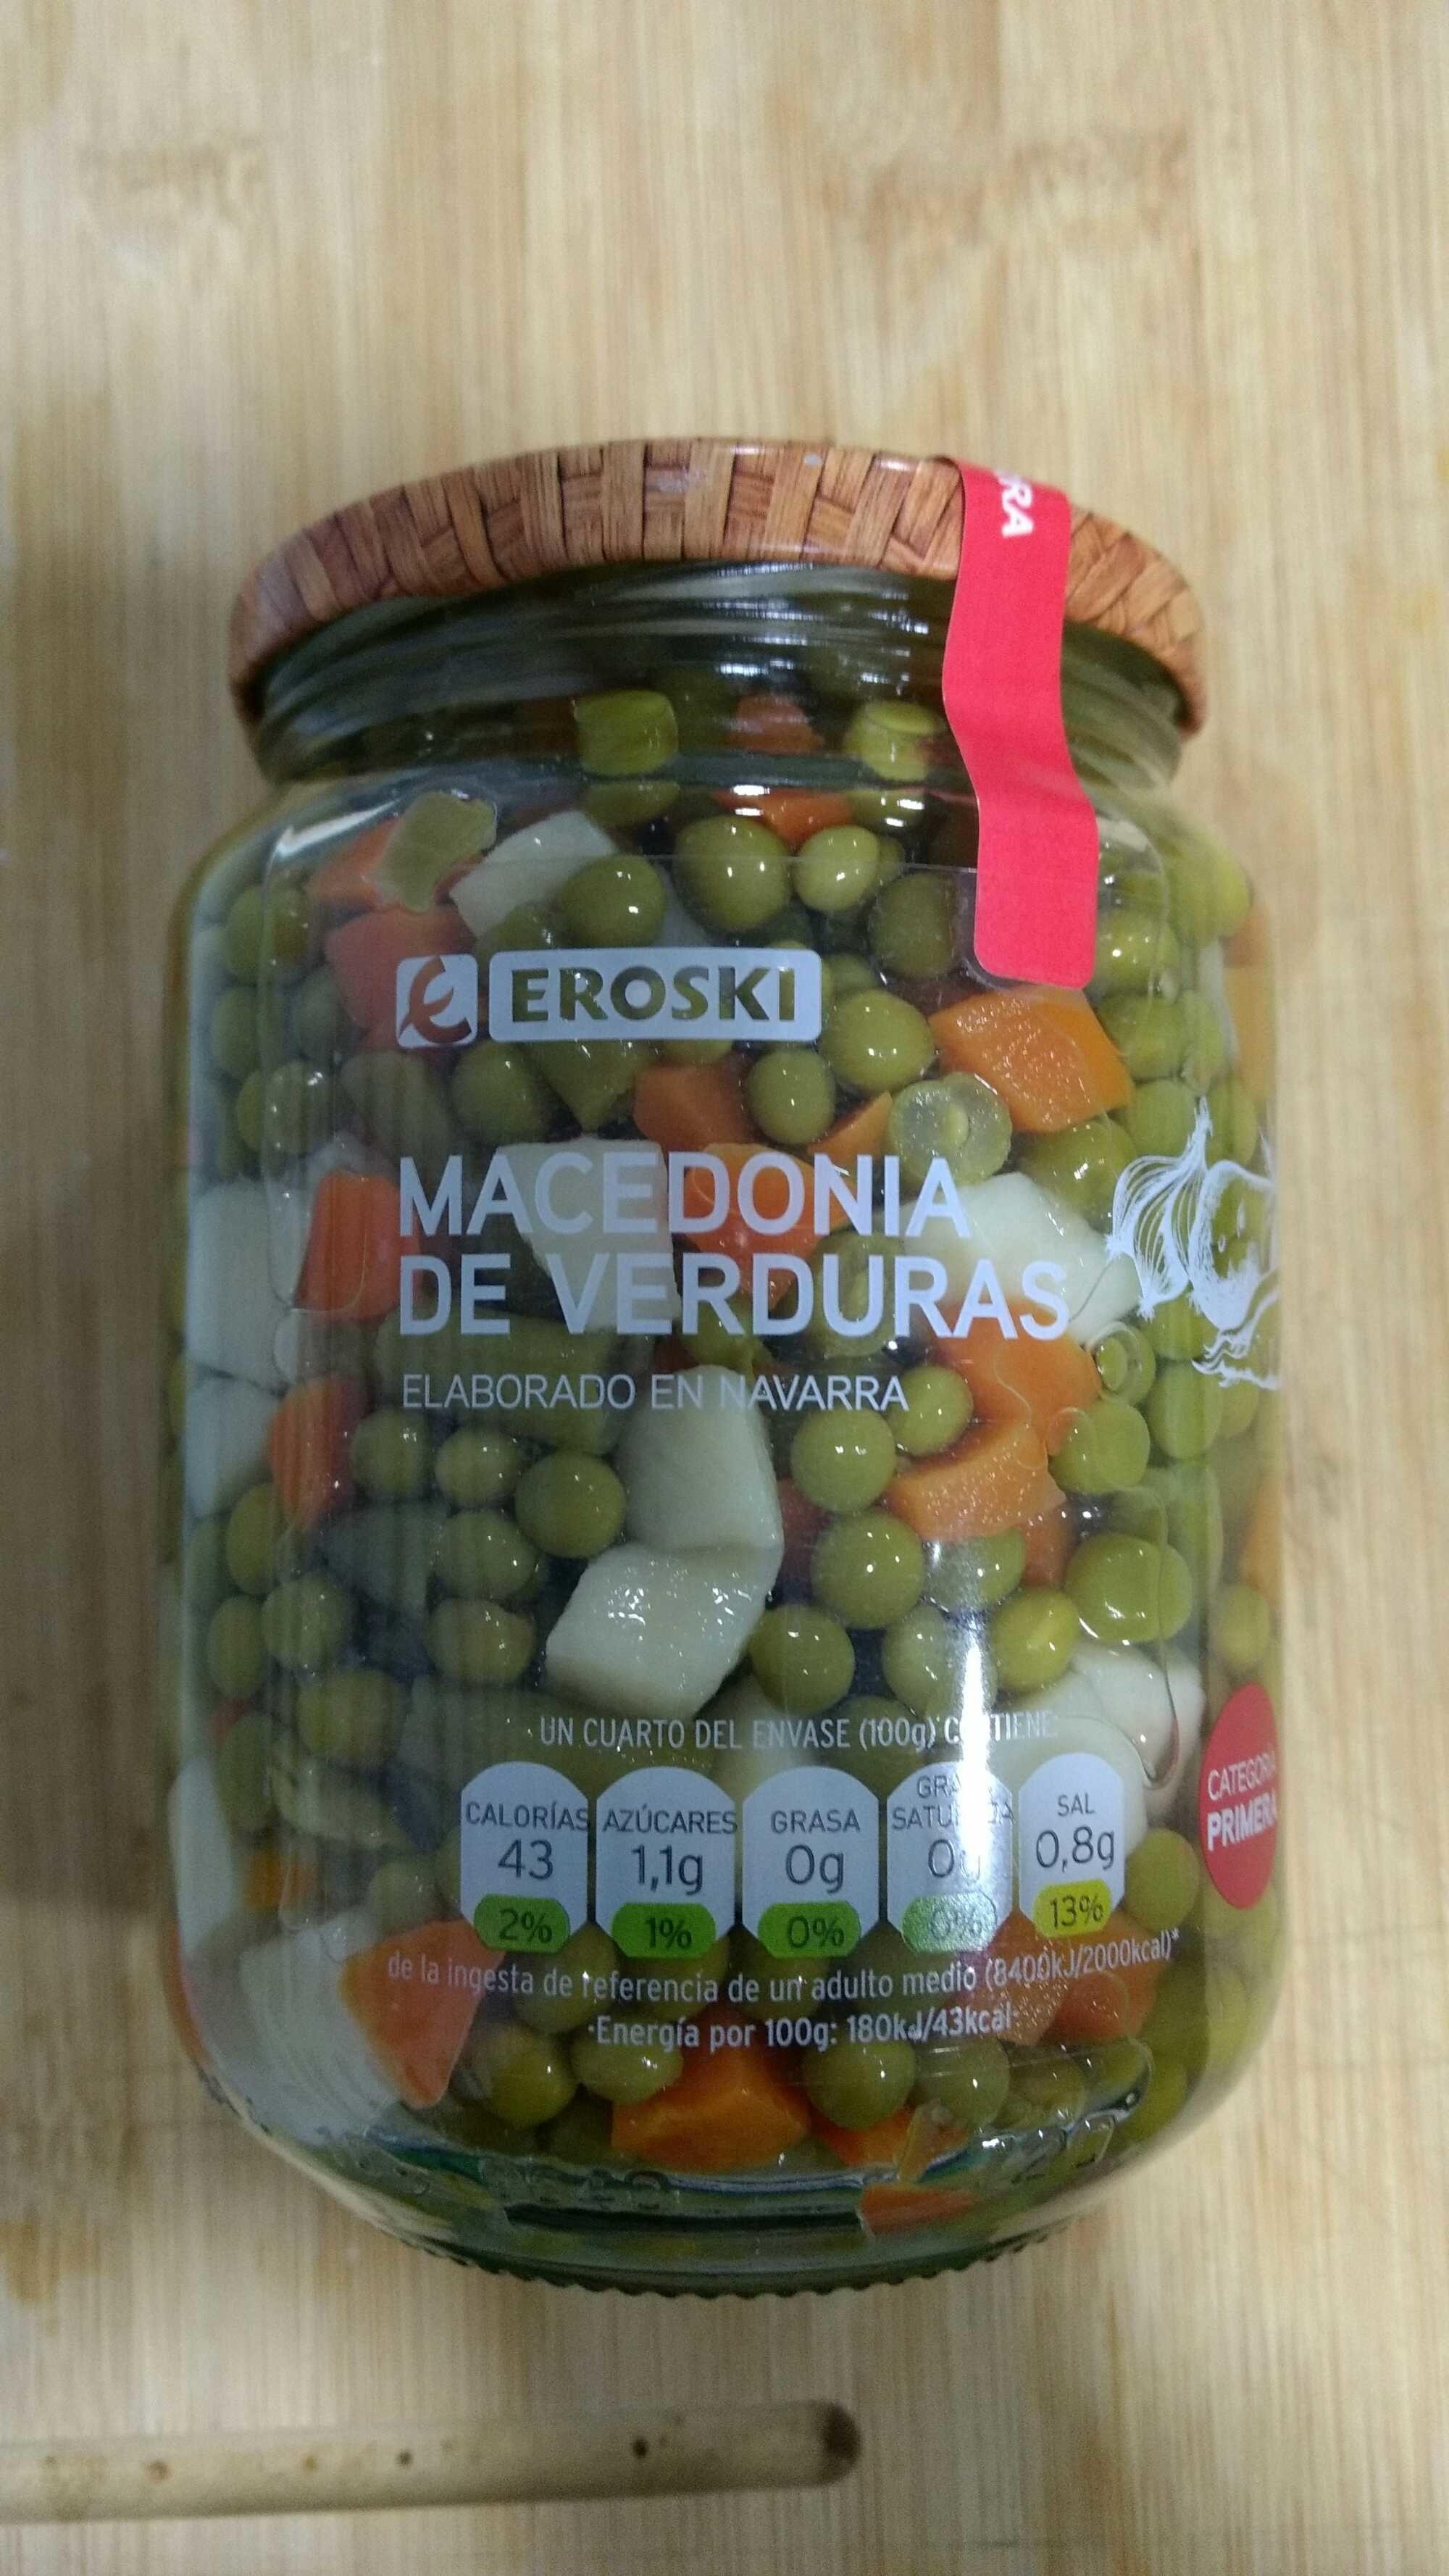 Macedonia de verduras - Product